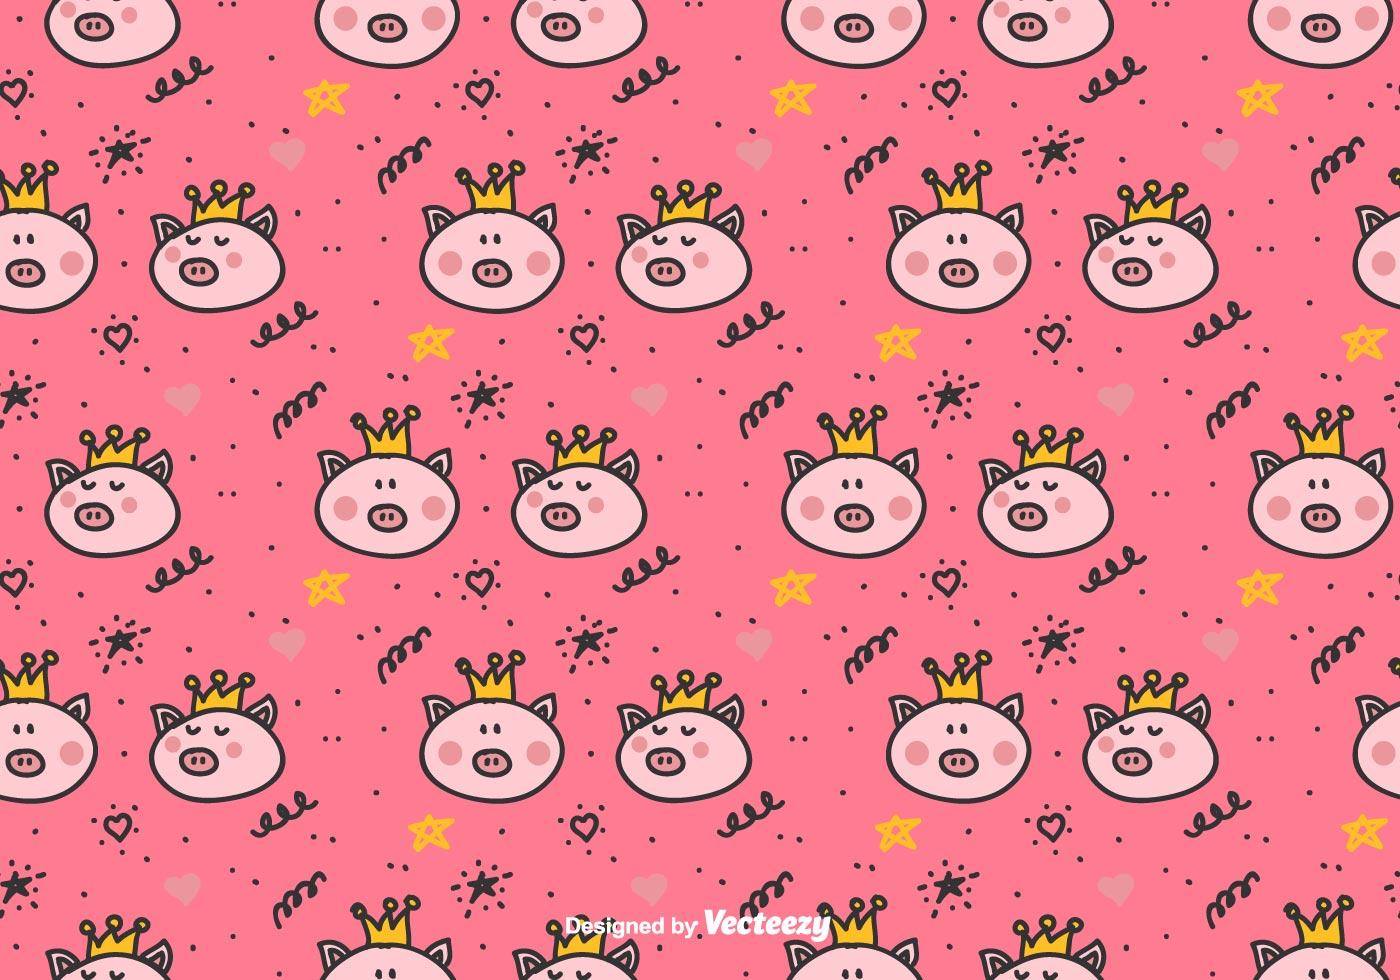 Cute Baby Pig Wallpaper Princess Pigs Vector Pattern Download Free Vector Art